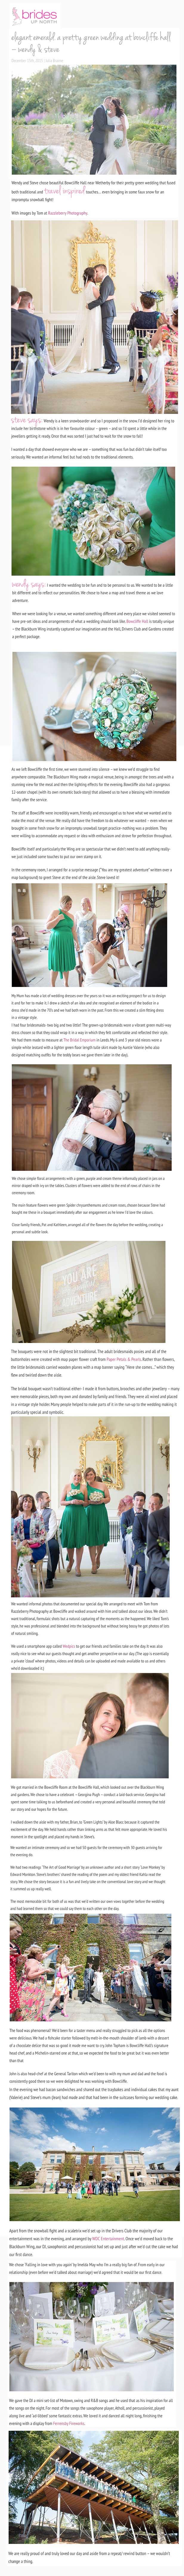 Brides-up-North-Wedding-coverage